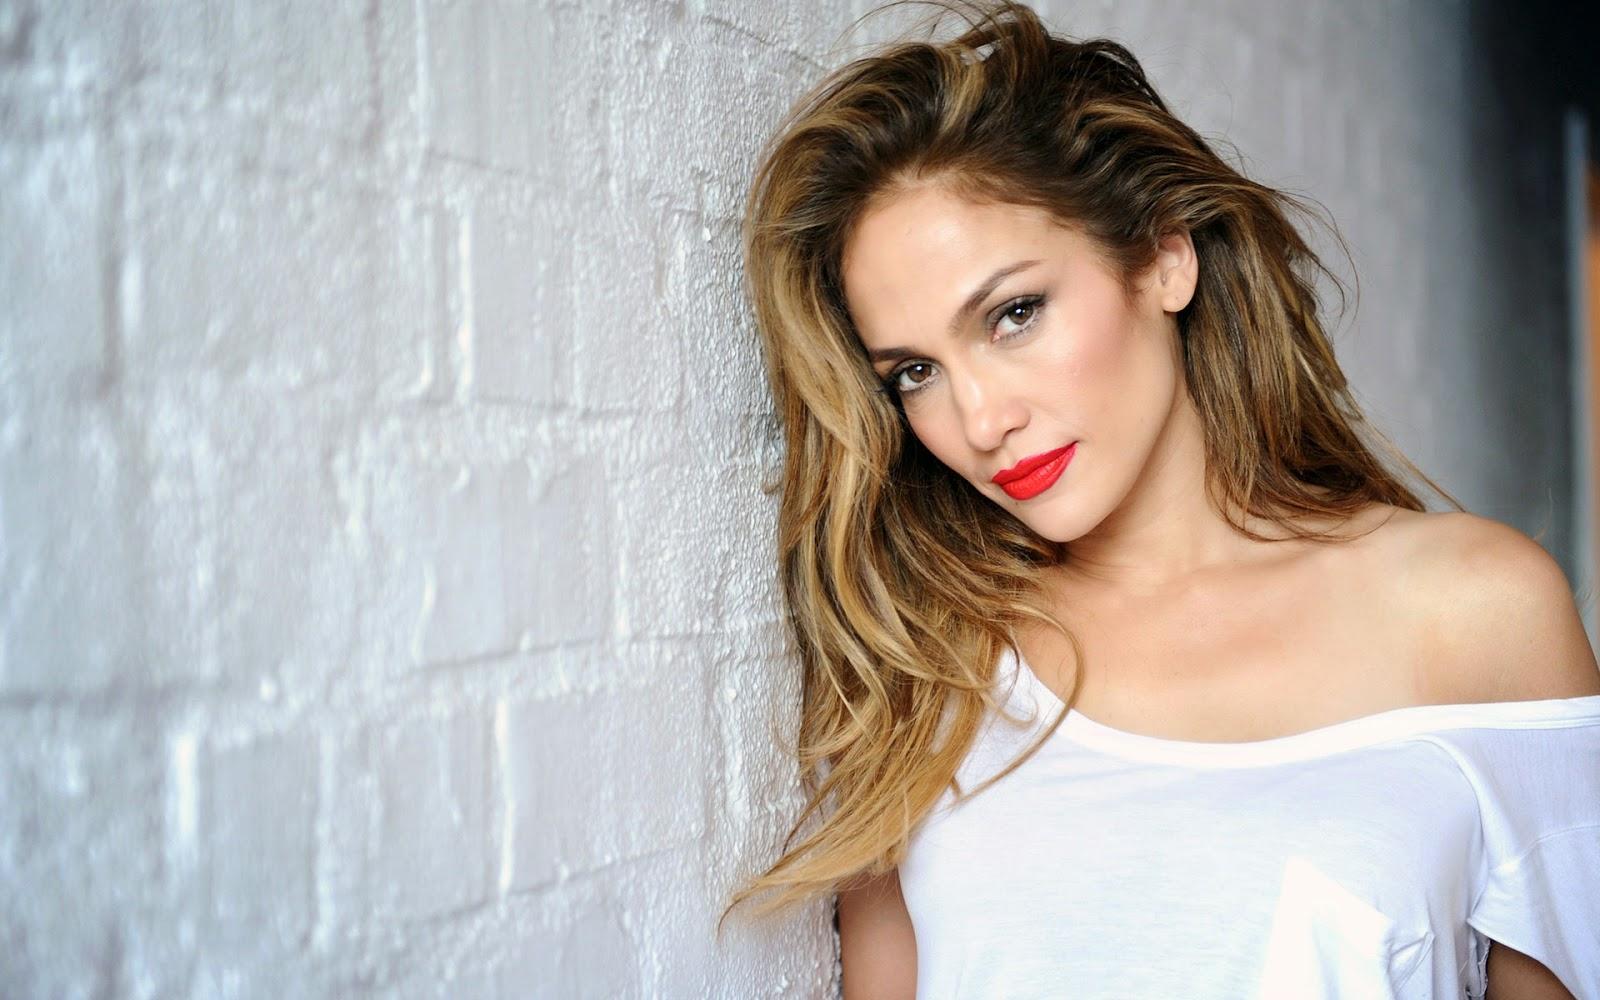 Papel de parede da celebridade cantora internacional Jennifer Lopez para pc hd 3d grátis celebrity wallpaper hd image